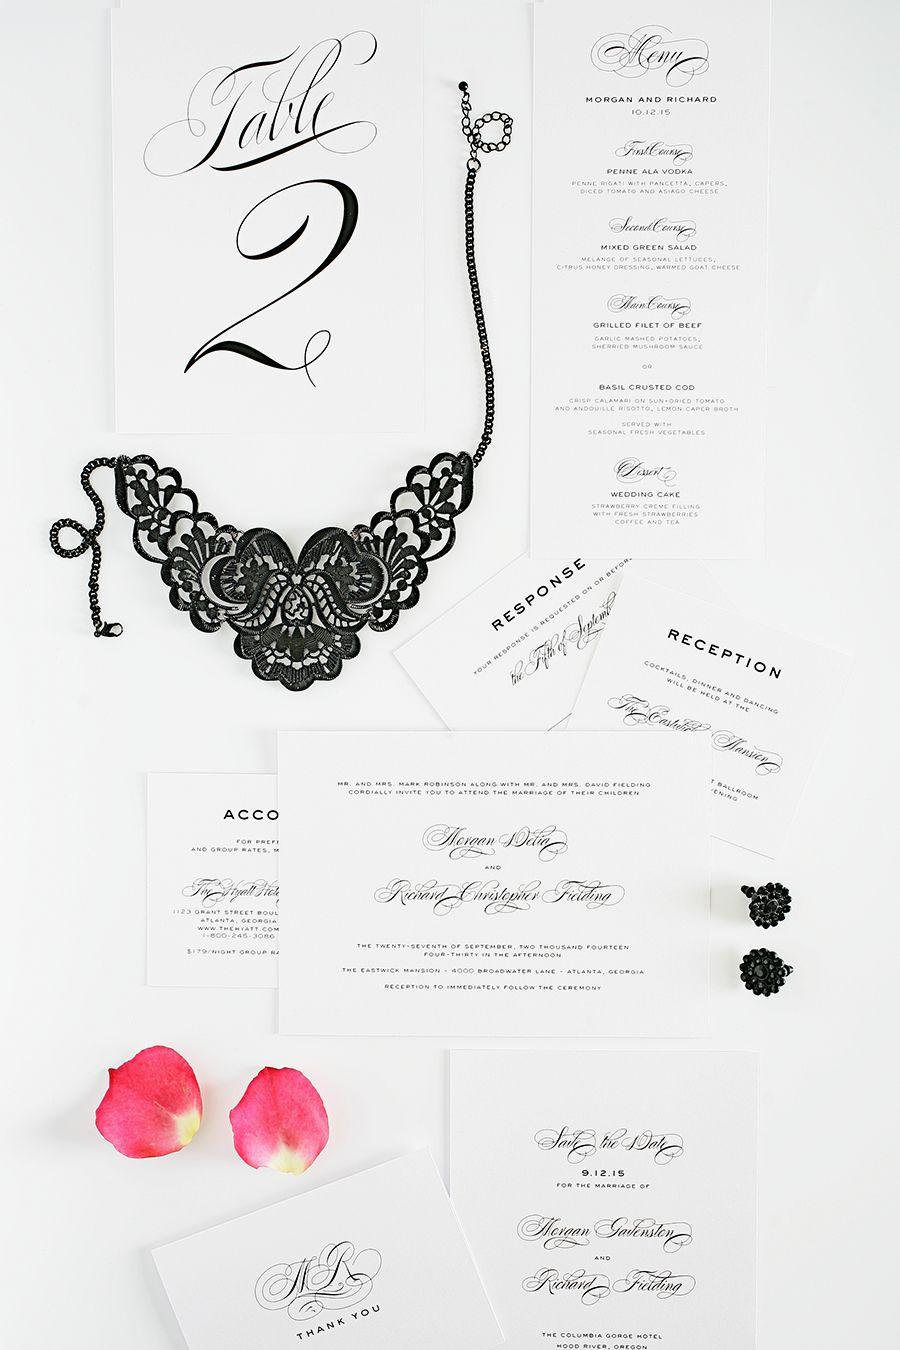 classic and modern black tie wedding invitations. love!